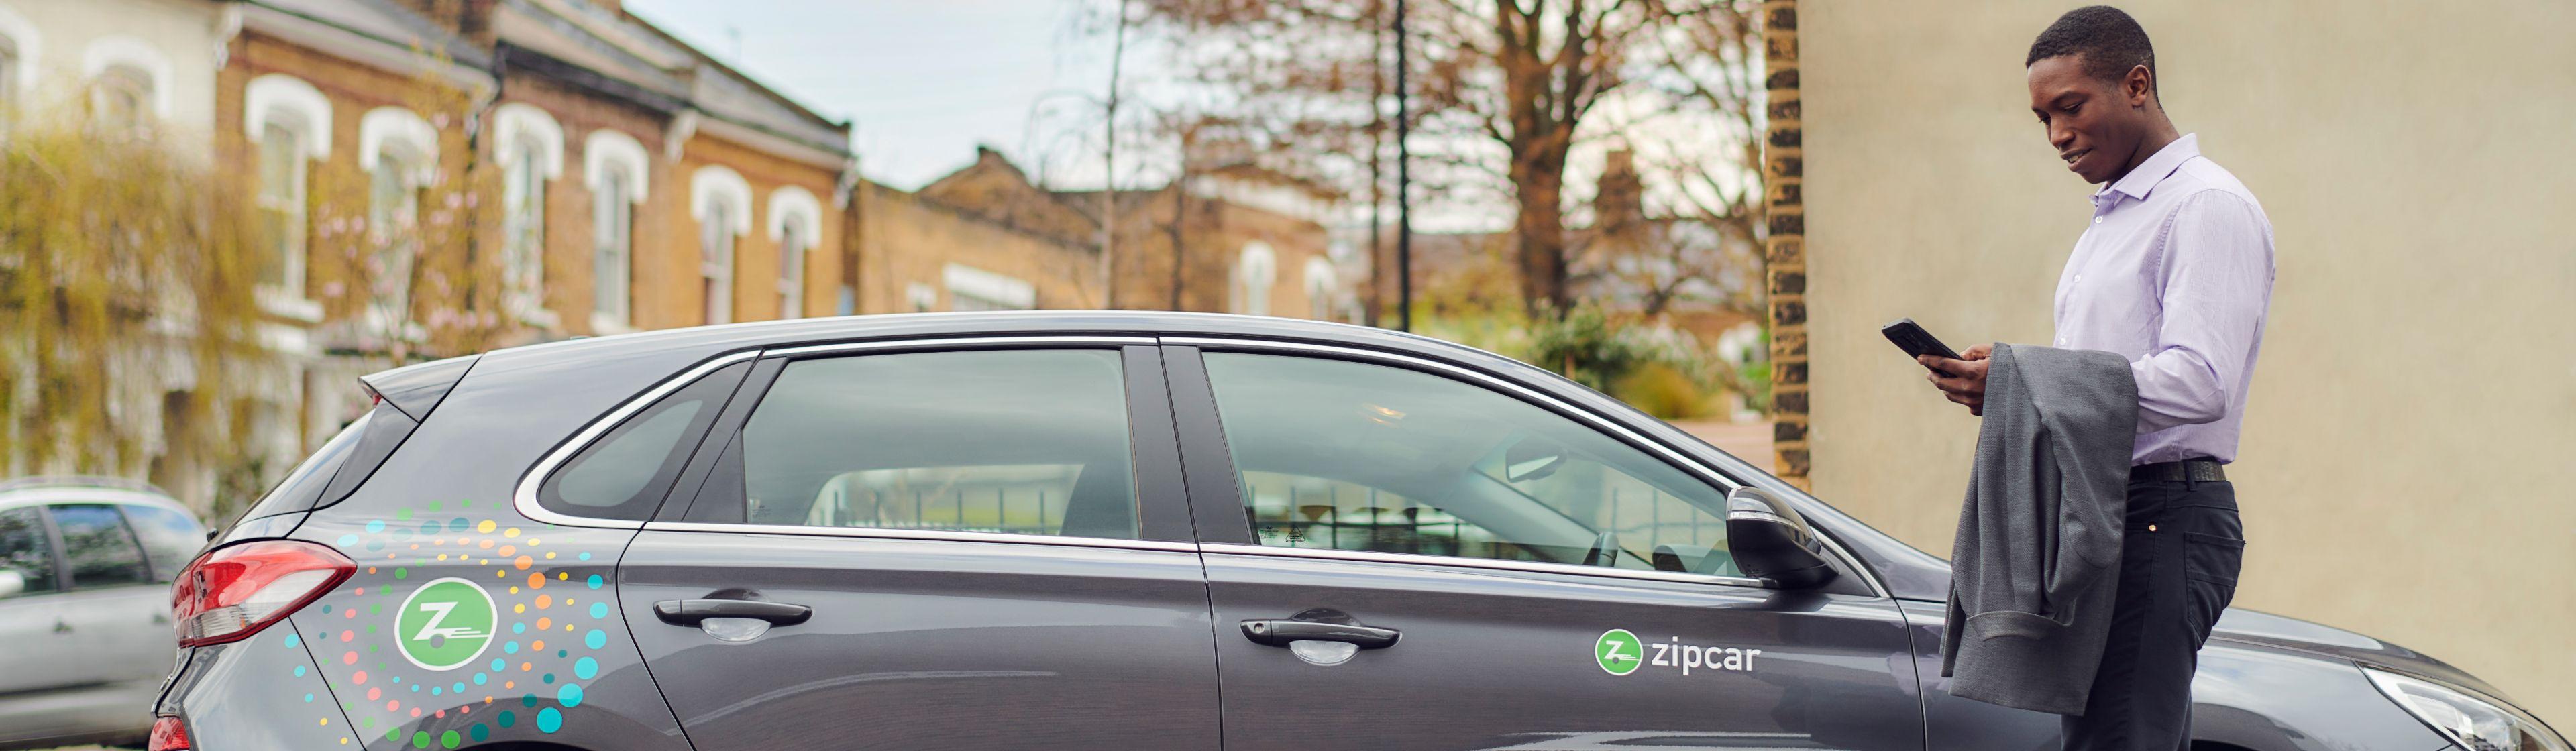 man booking a zipcar